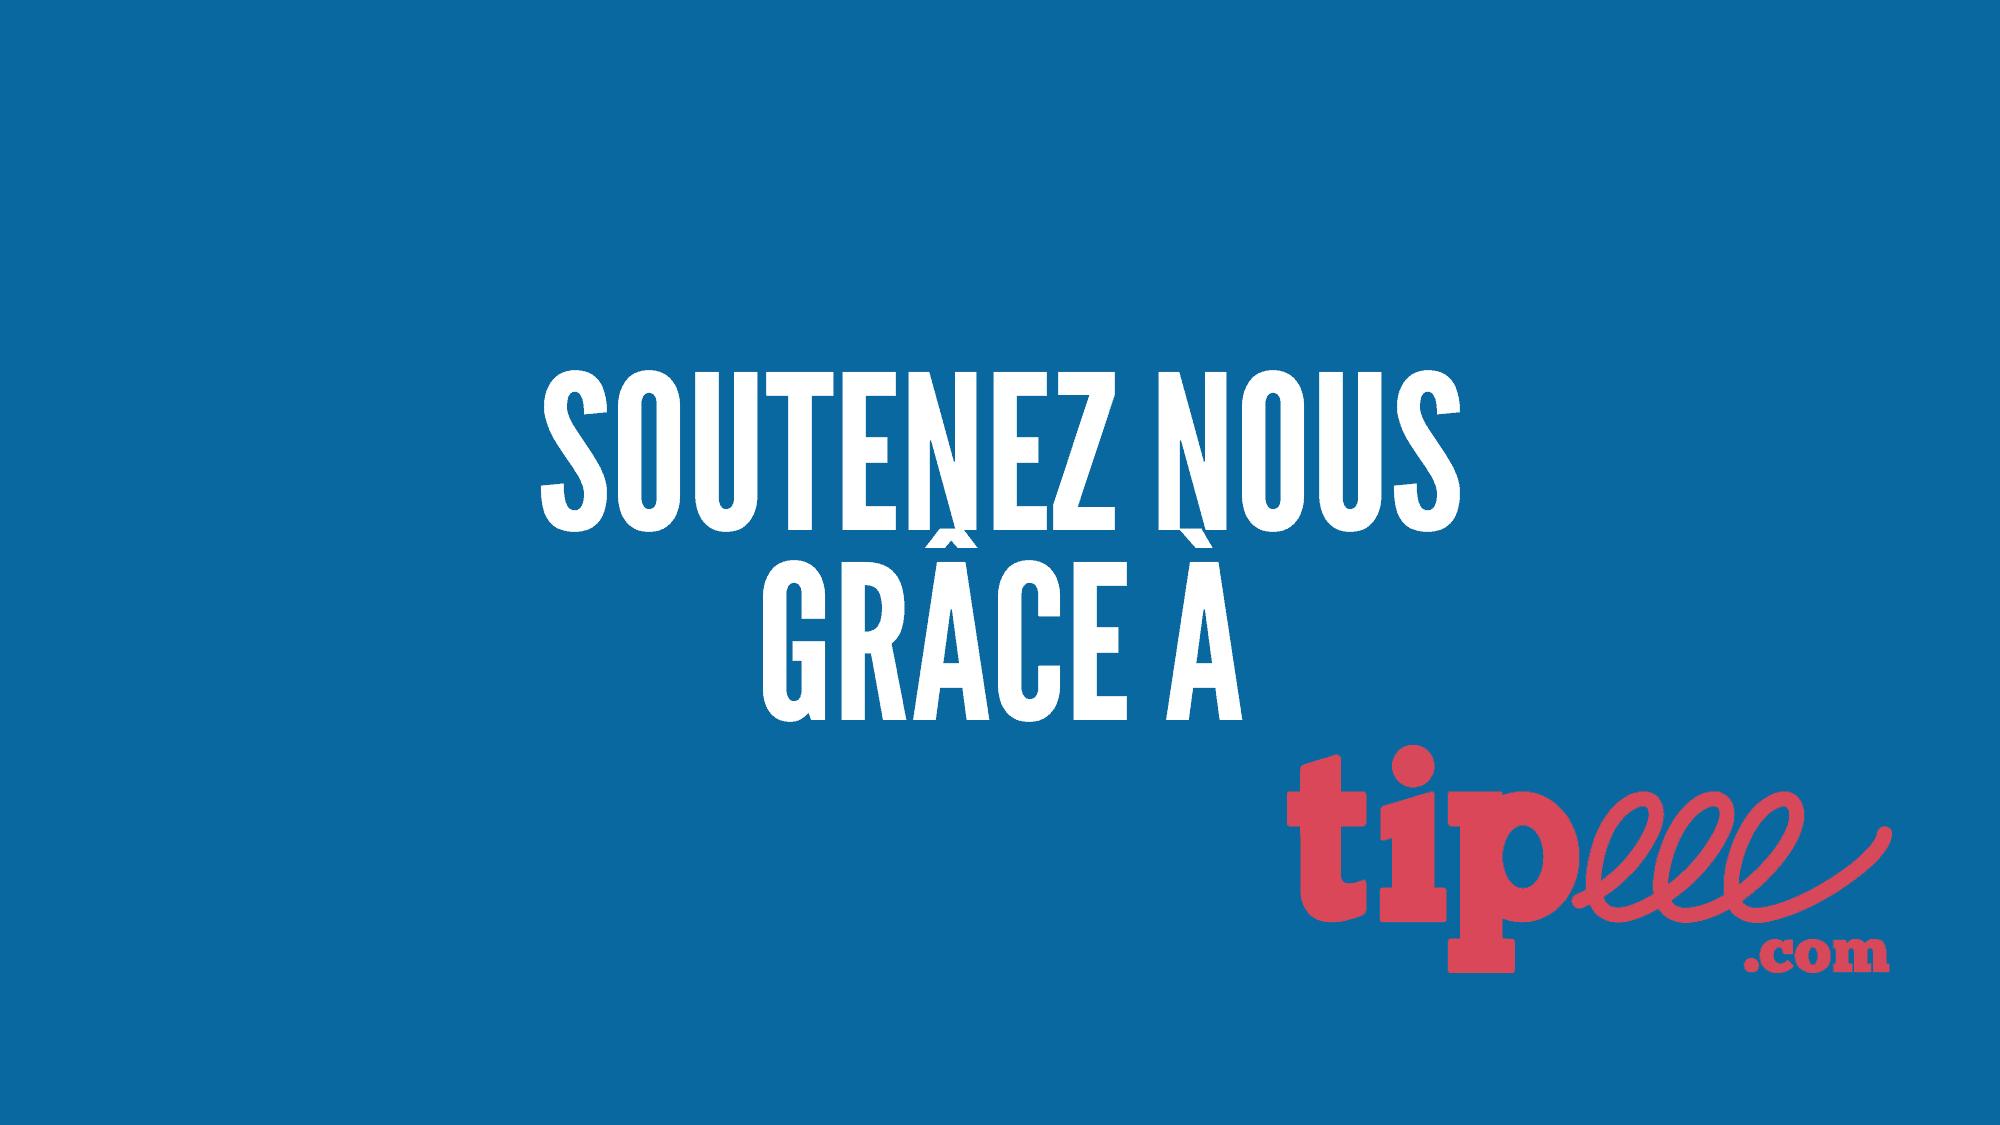 https://domoandgeek.fr/wp-content/uploads/2019/06/20190606_214112_0000.png